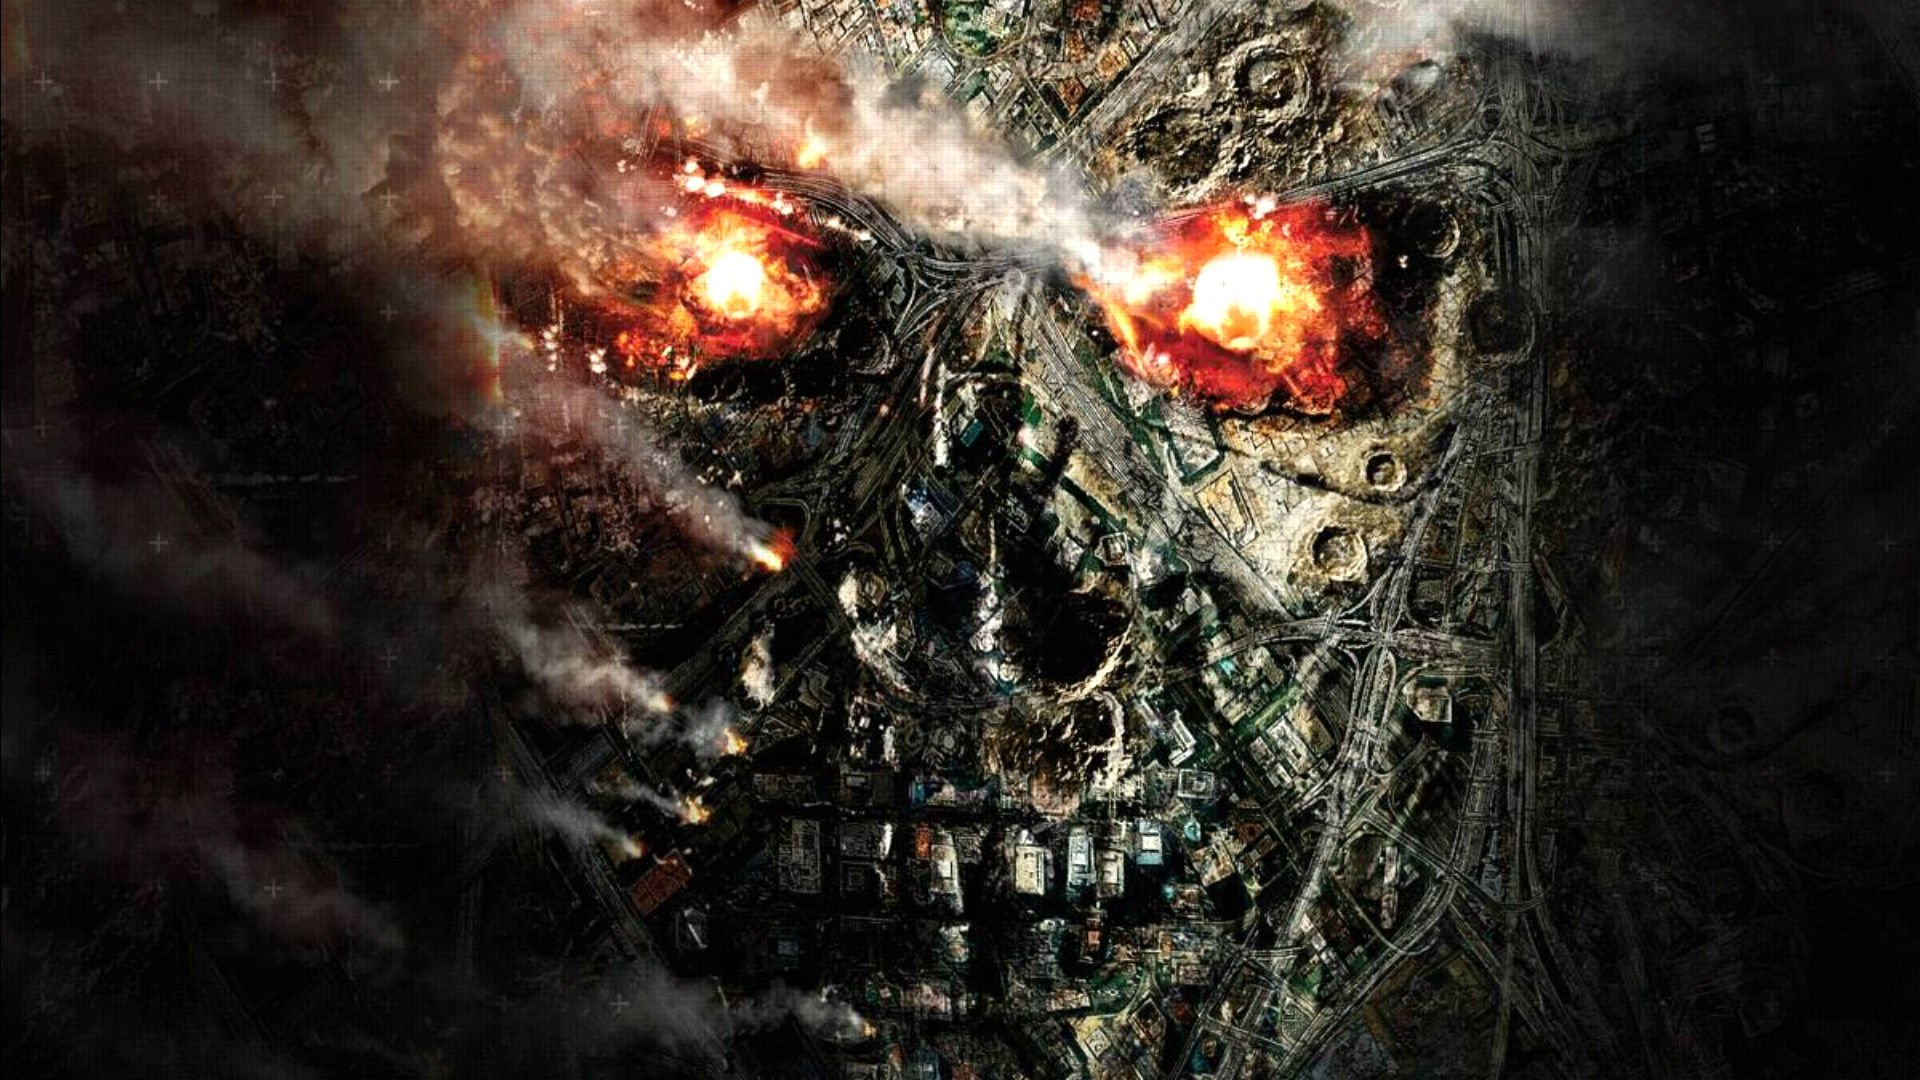 Terminator: Genisys desktop wallpaper